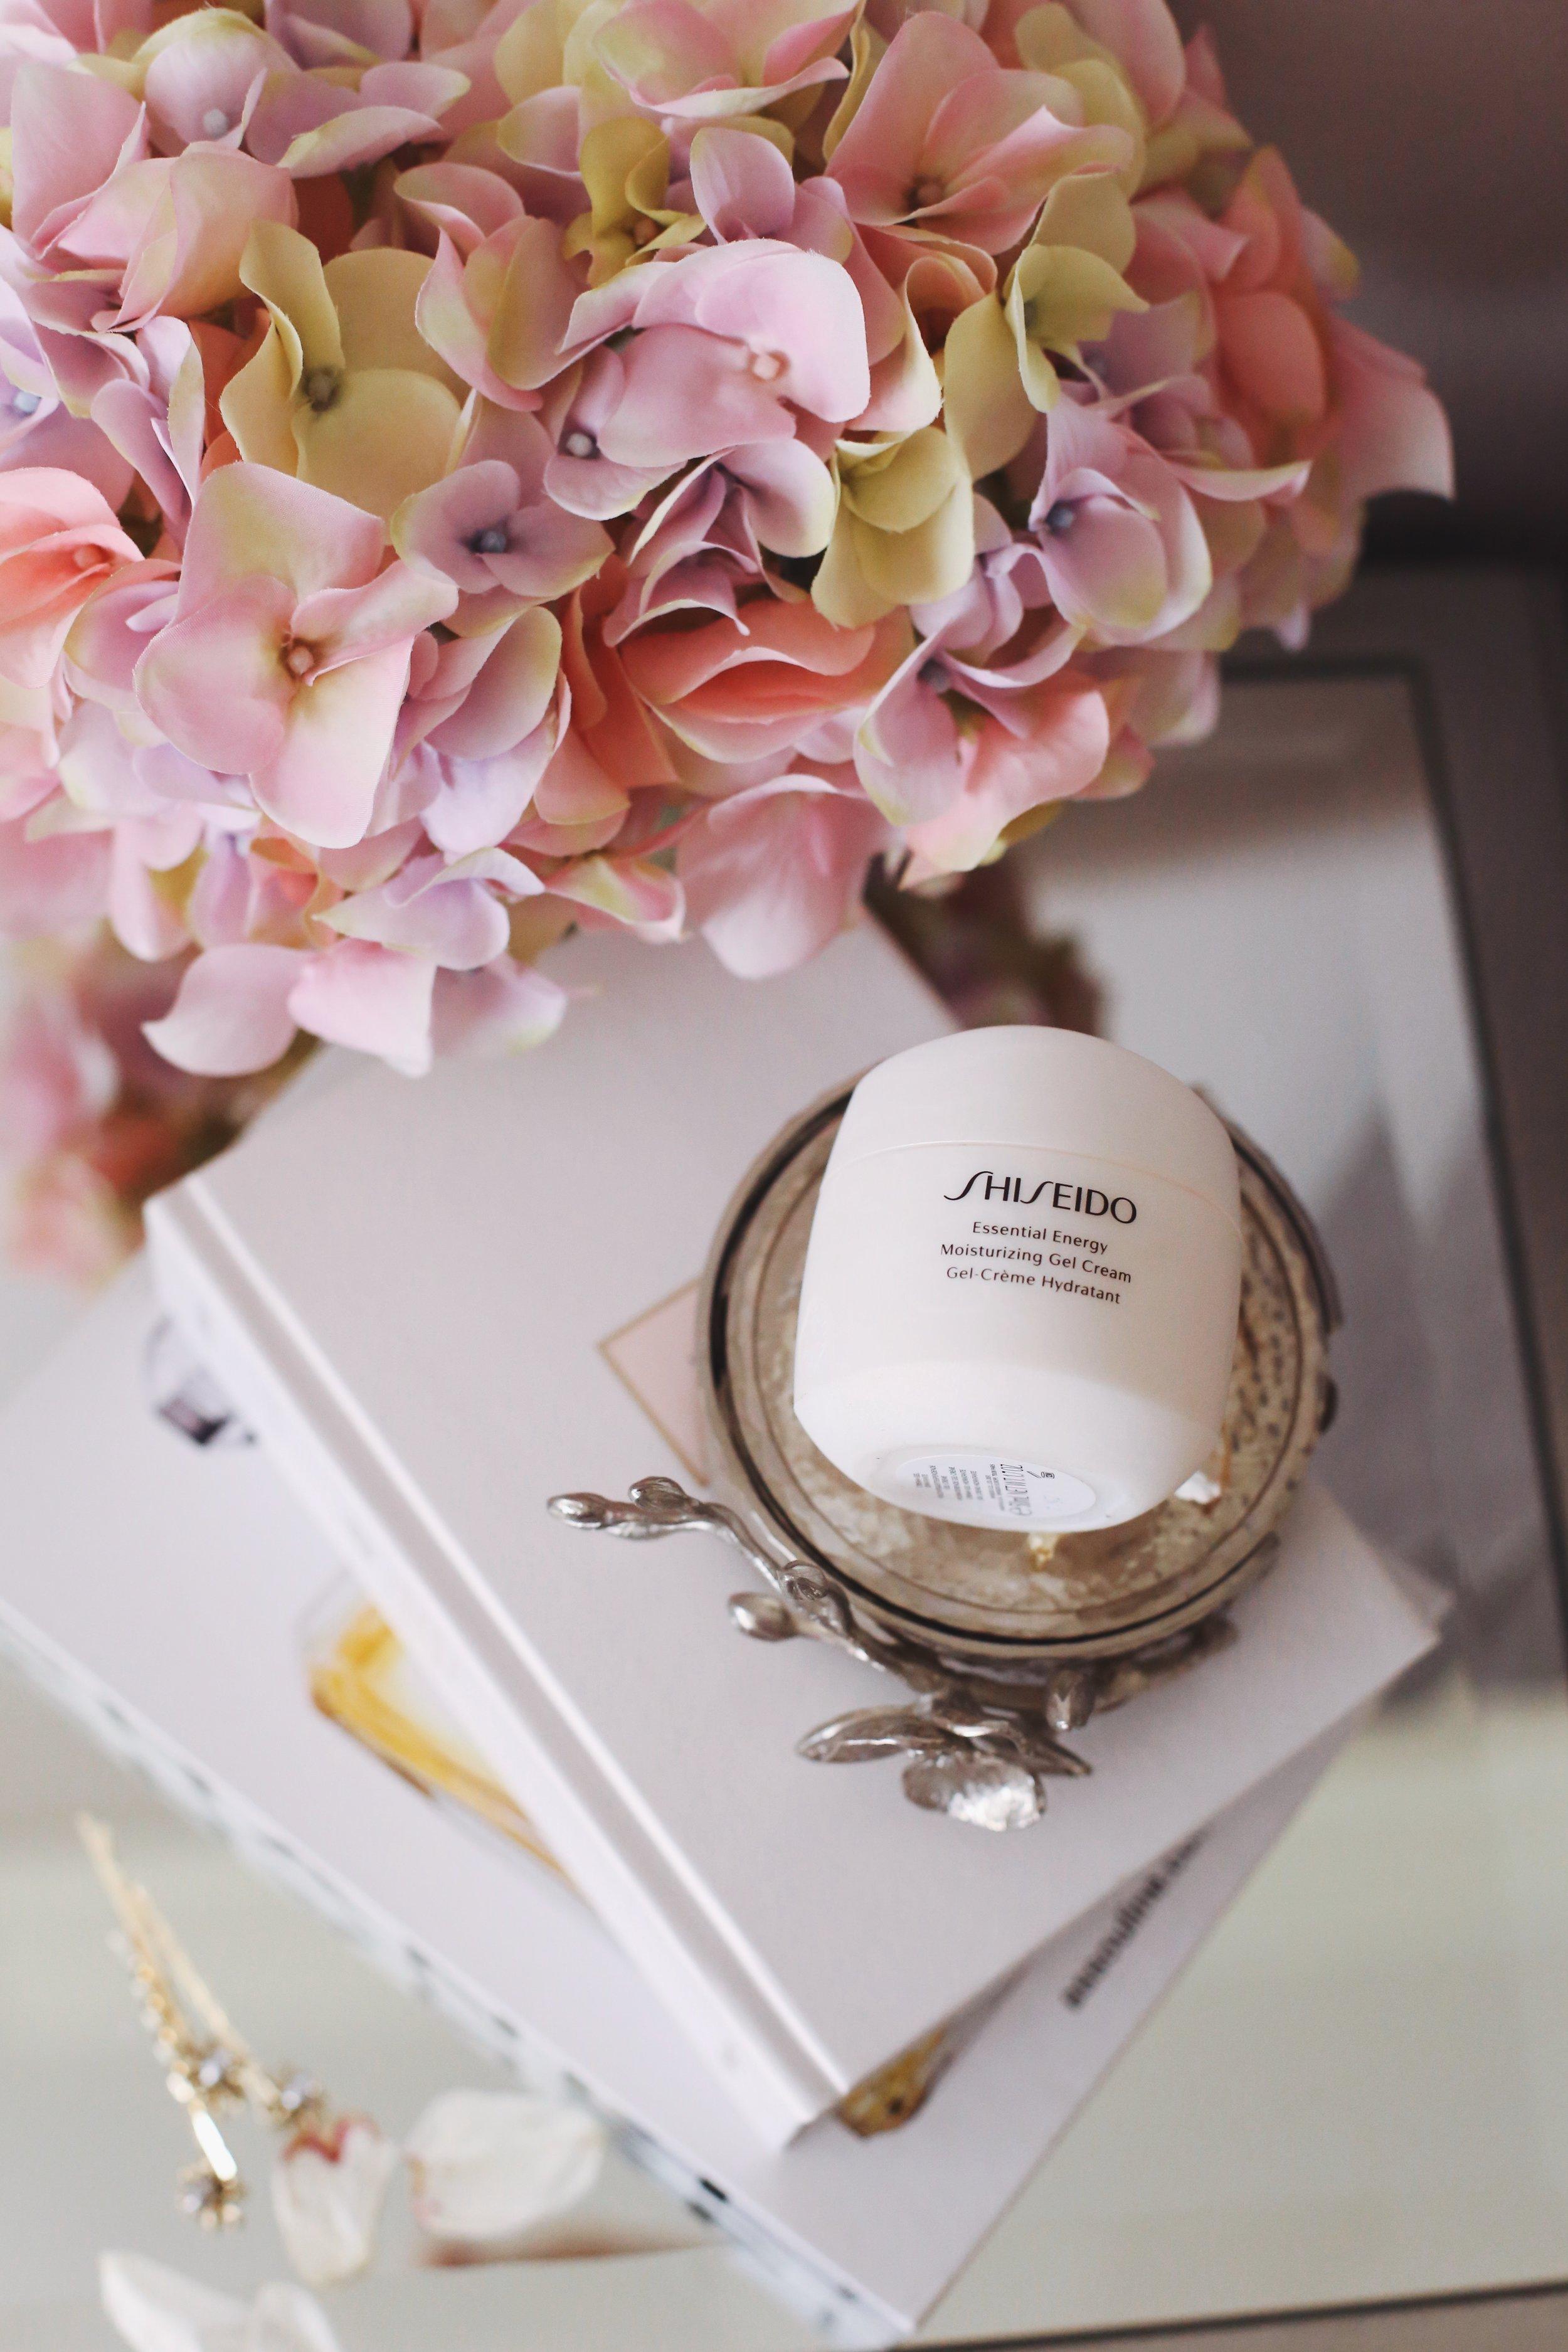 Shiseido Essential Energy Moisturizing Gel Cream ($48) - Targeting:✔Loss of firmness✔Dryness